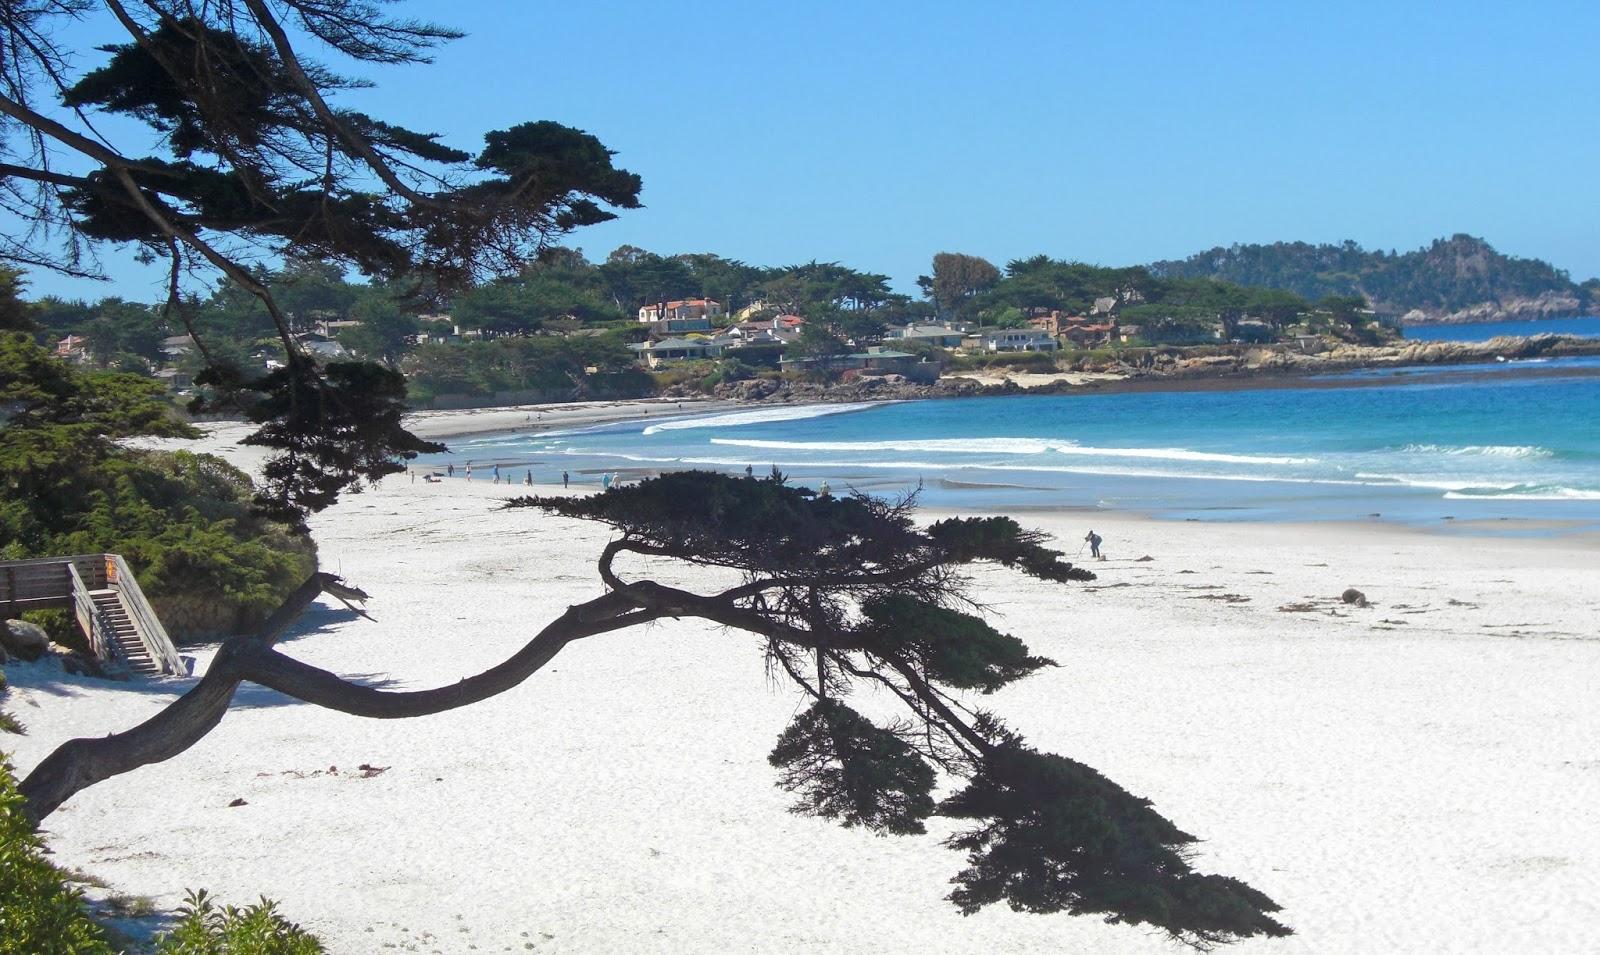 belezas-americanas-carmel-by-the-sea-secret-world